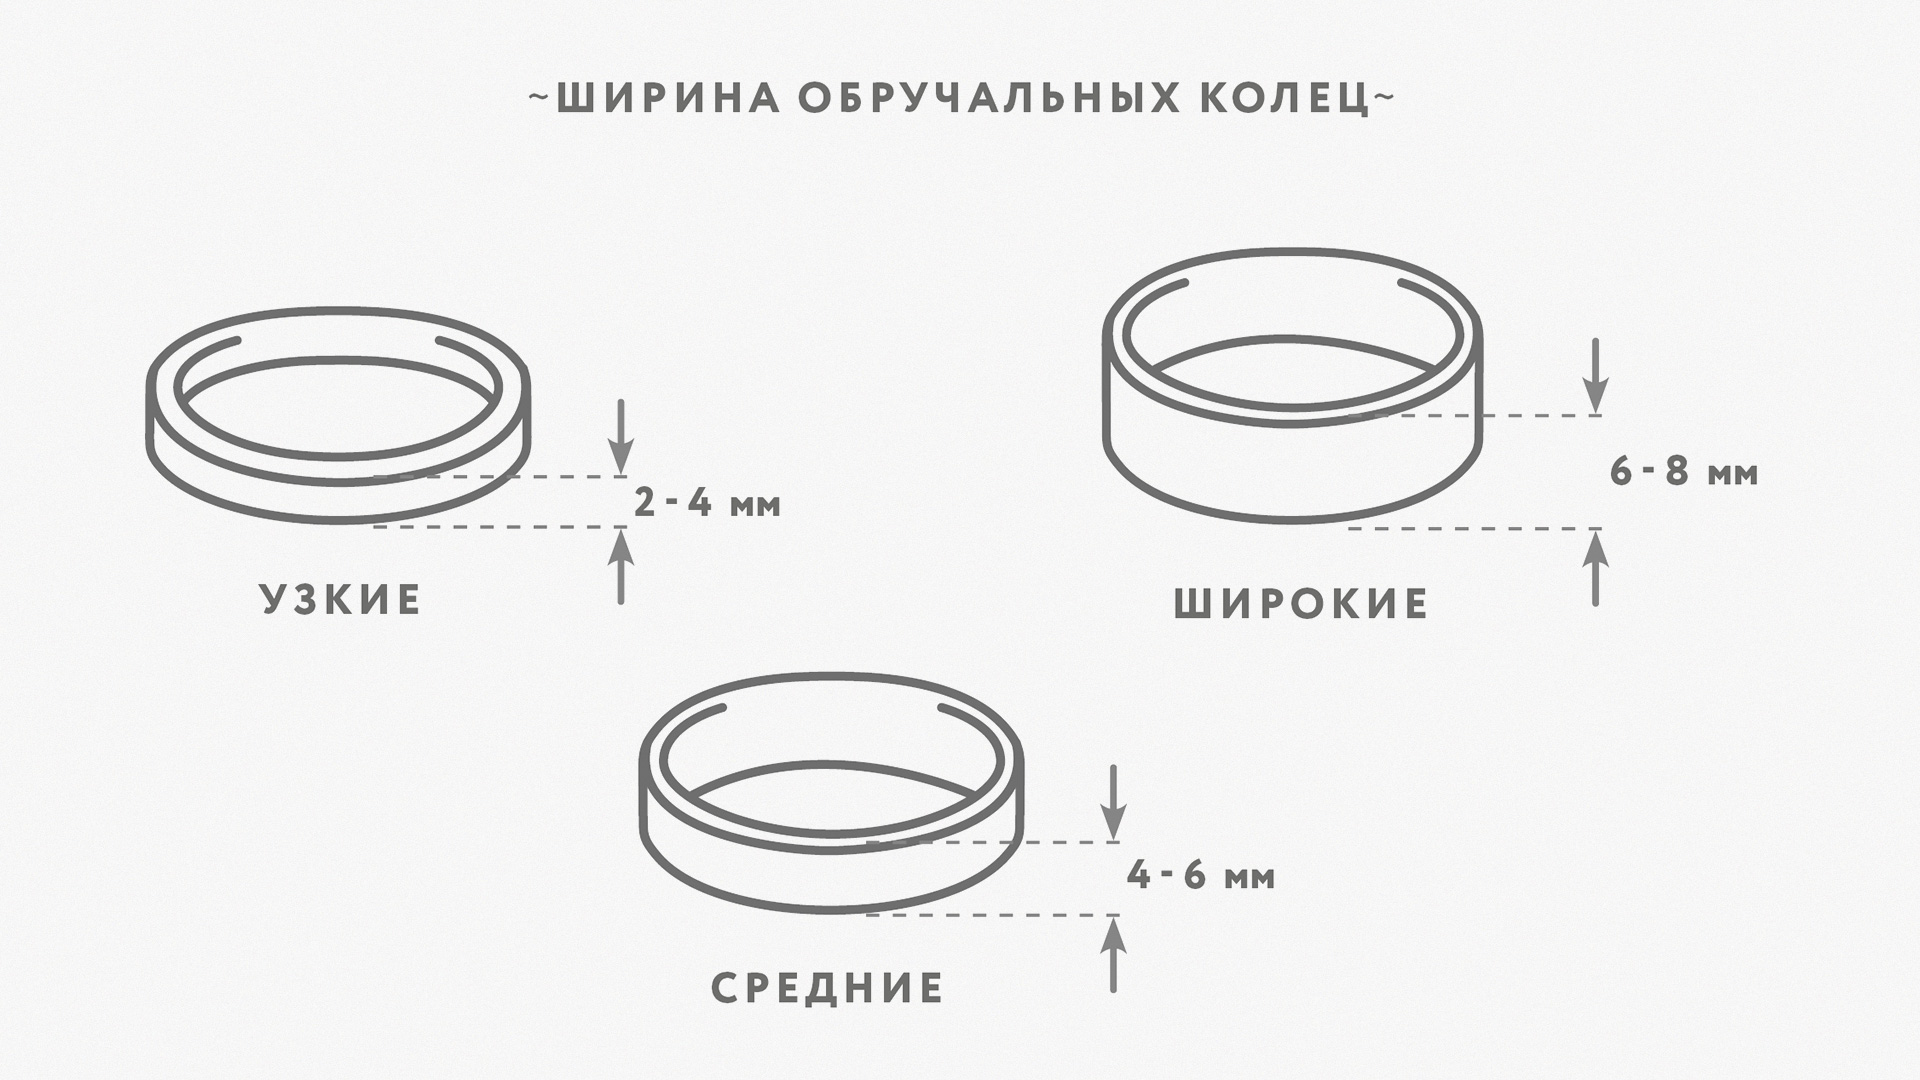 Ширина кольца